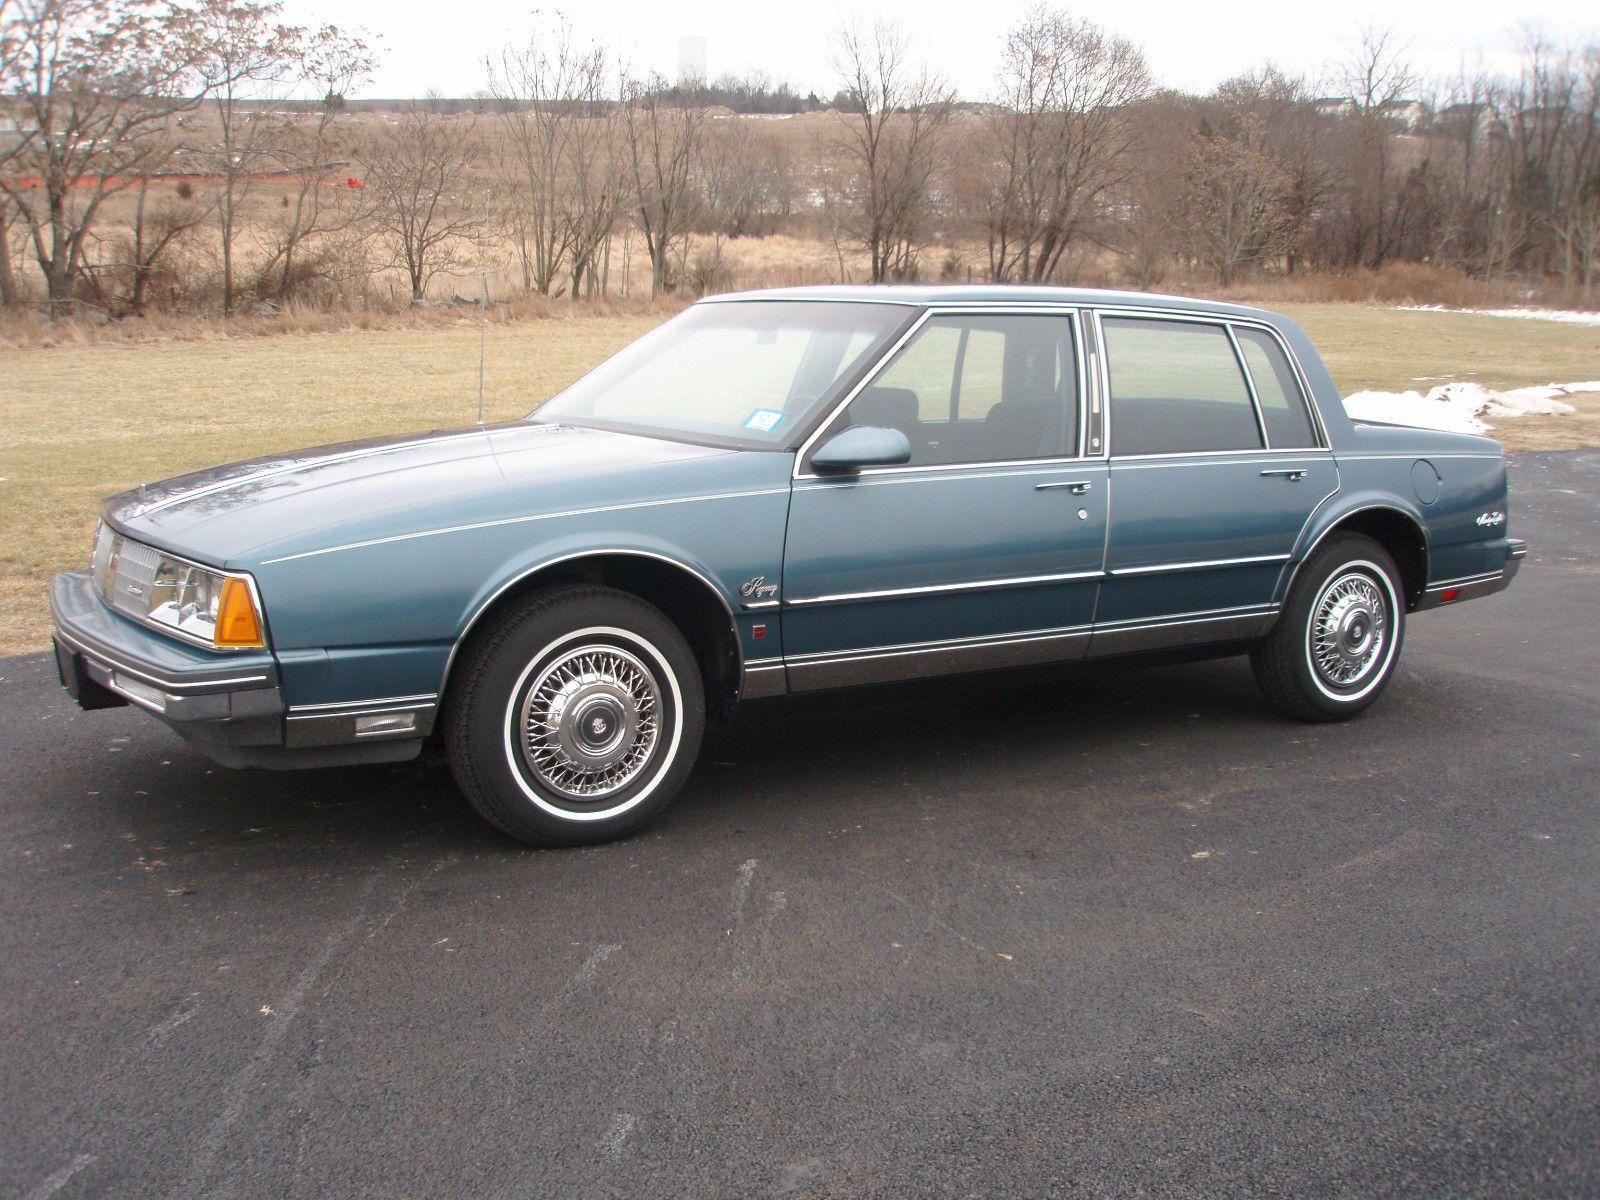 1985 oldsmobile ninety eight regency w 3 800 original miles these were very nice